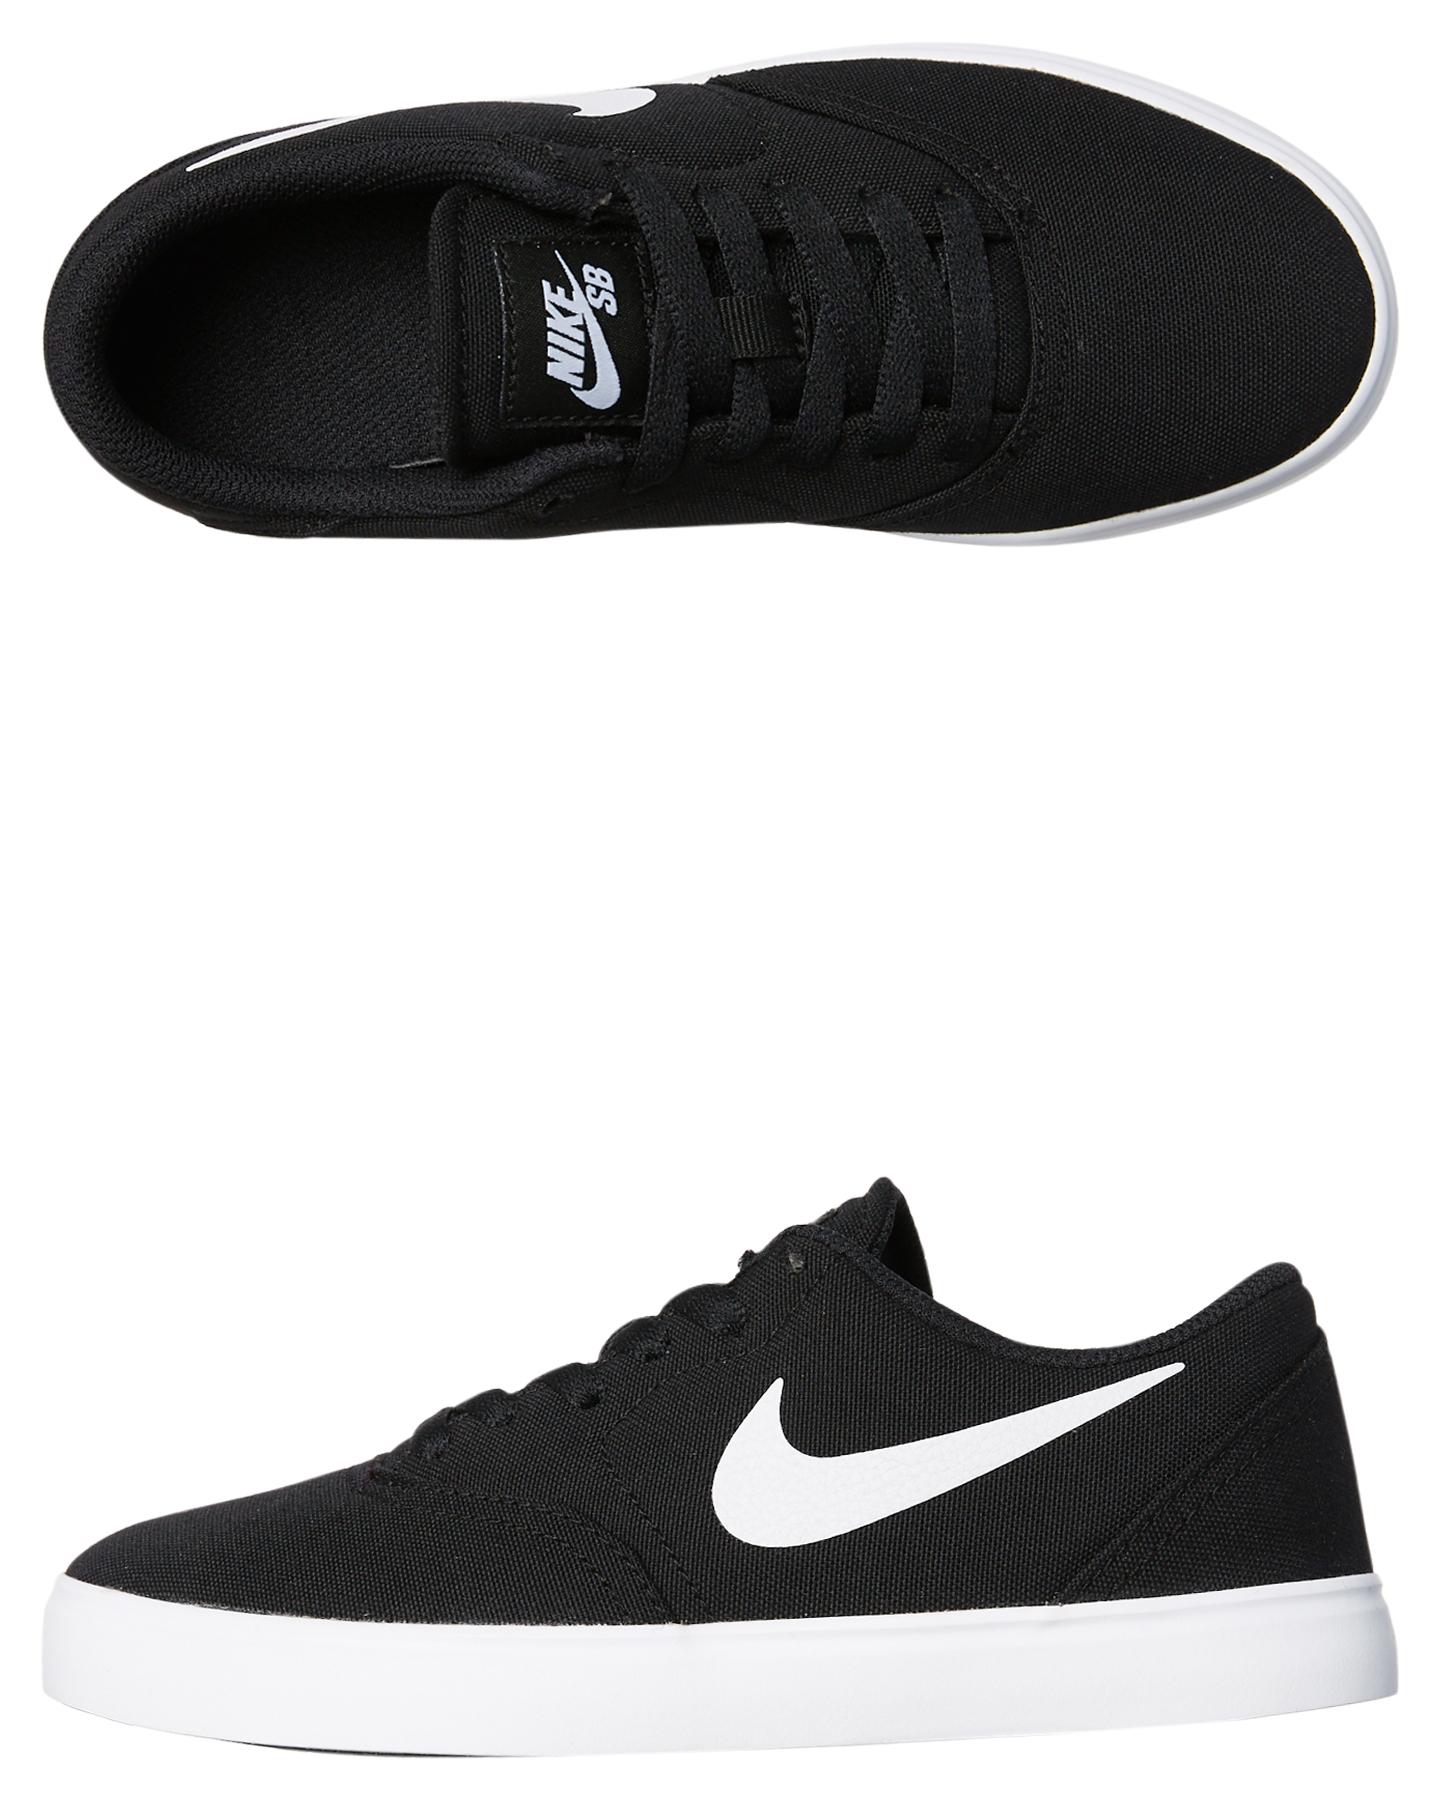 quality design d3e70 5b304 Nike Kids Teens Boys Sb Check Canvas Shoe - Black White | SurfStitch